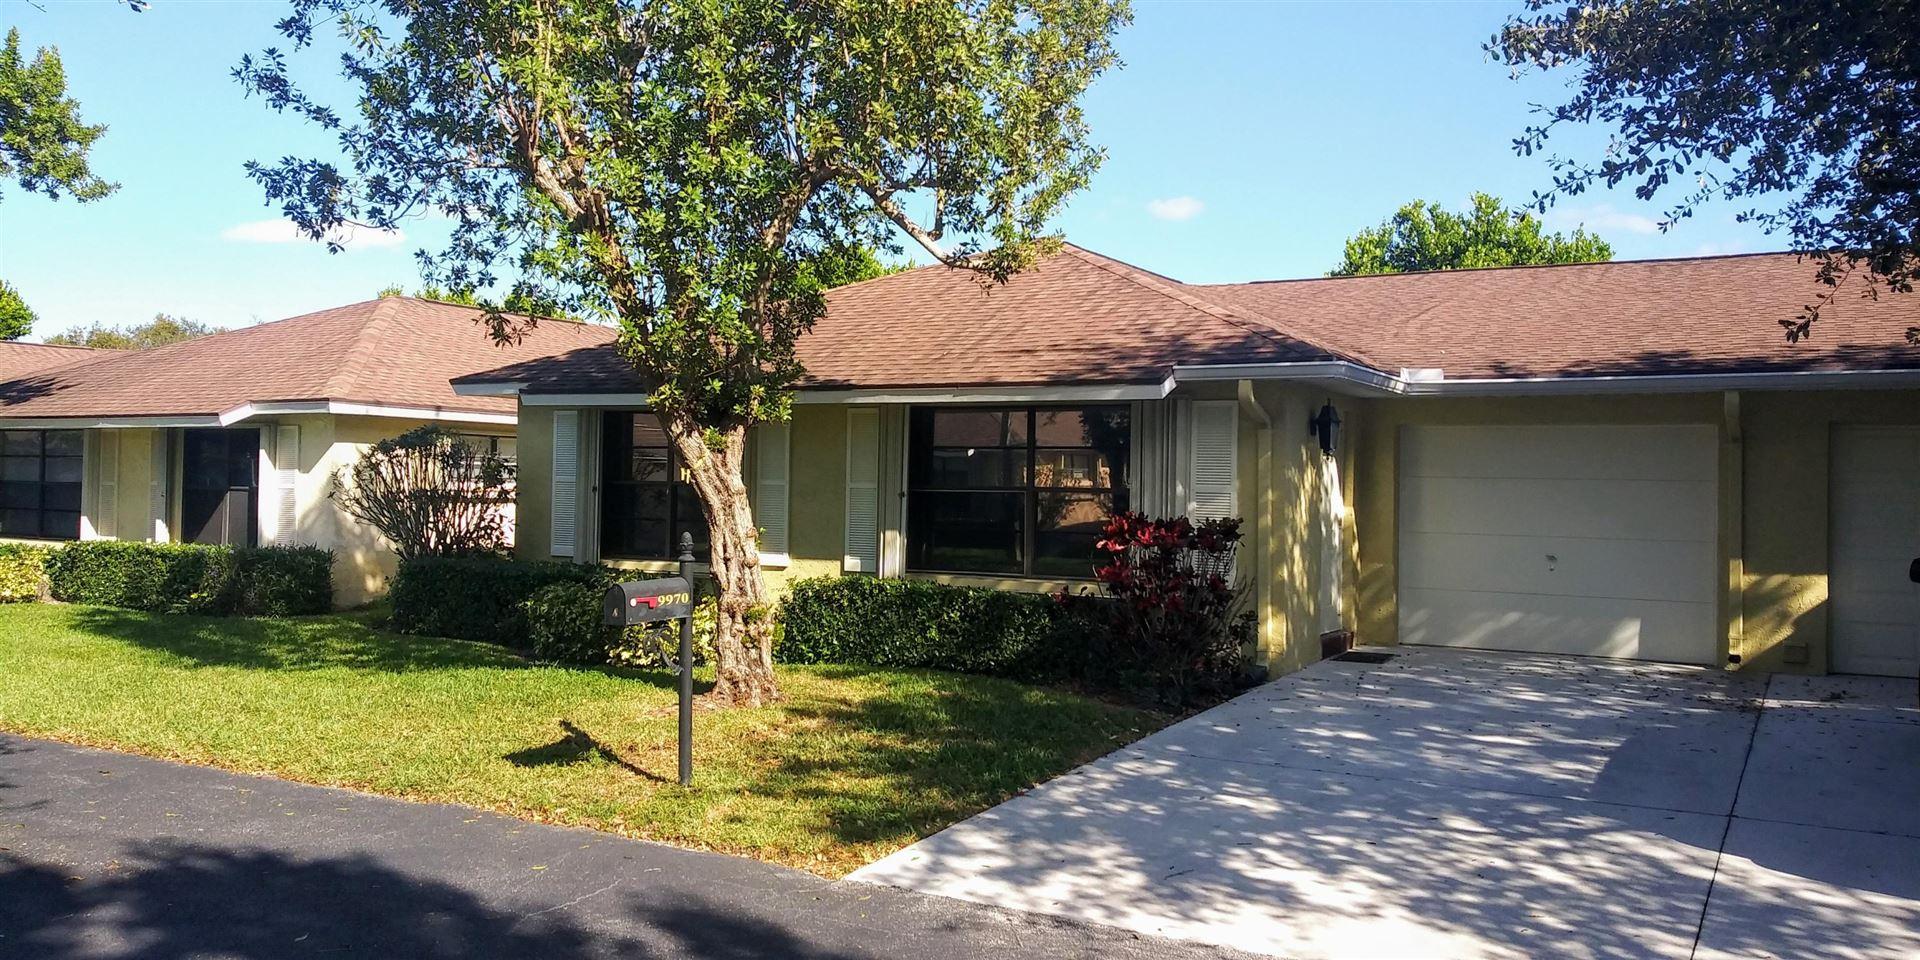 9970 Ligustrum Tree Way #A, Boynton Beach, FL 33436 - #: RX-10585732